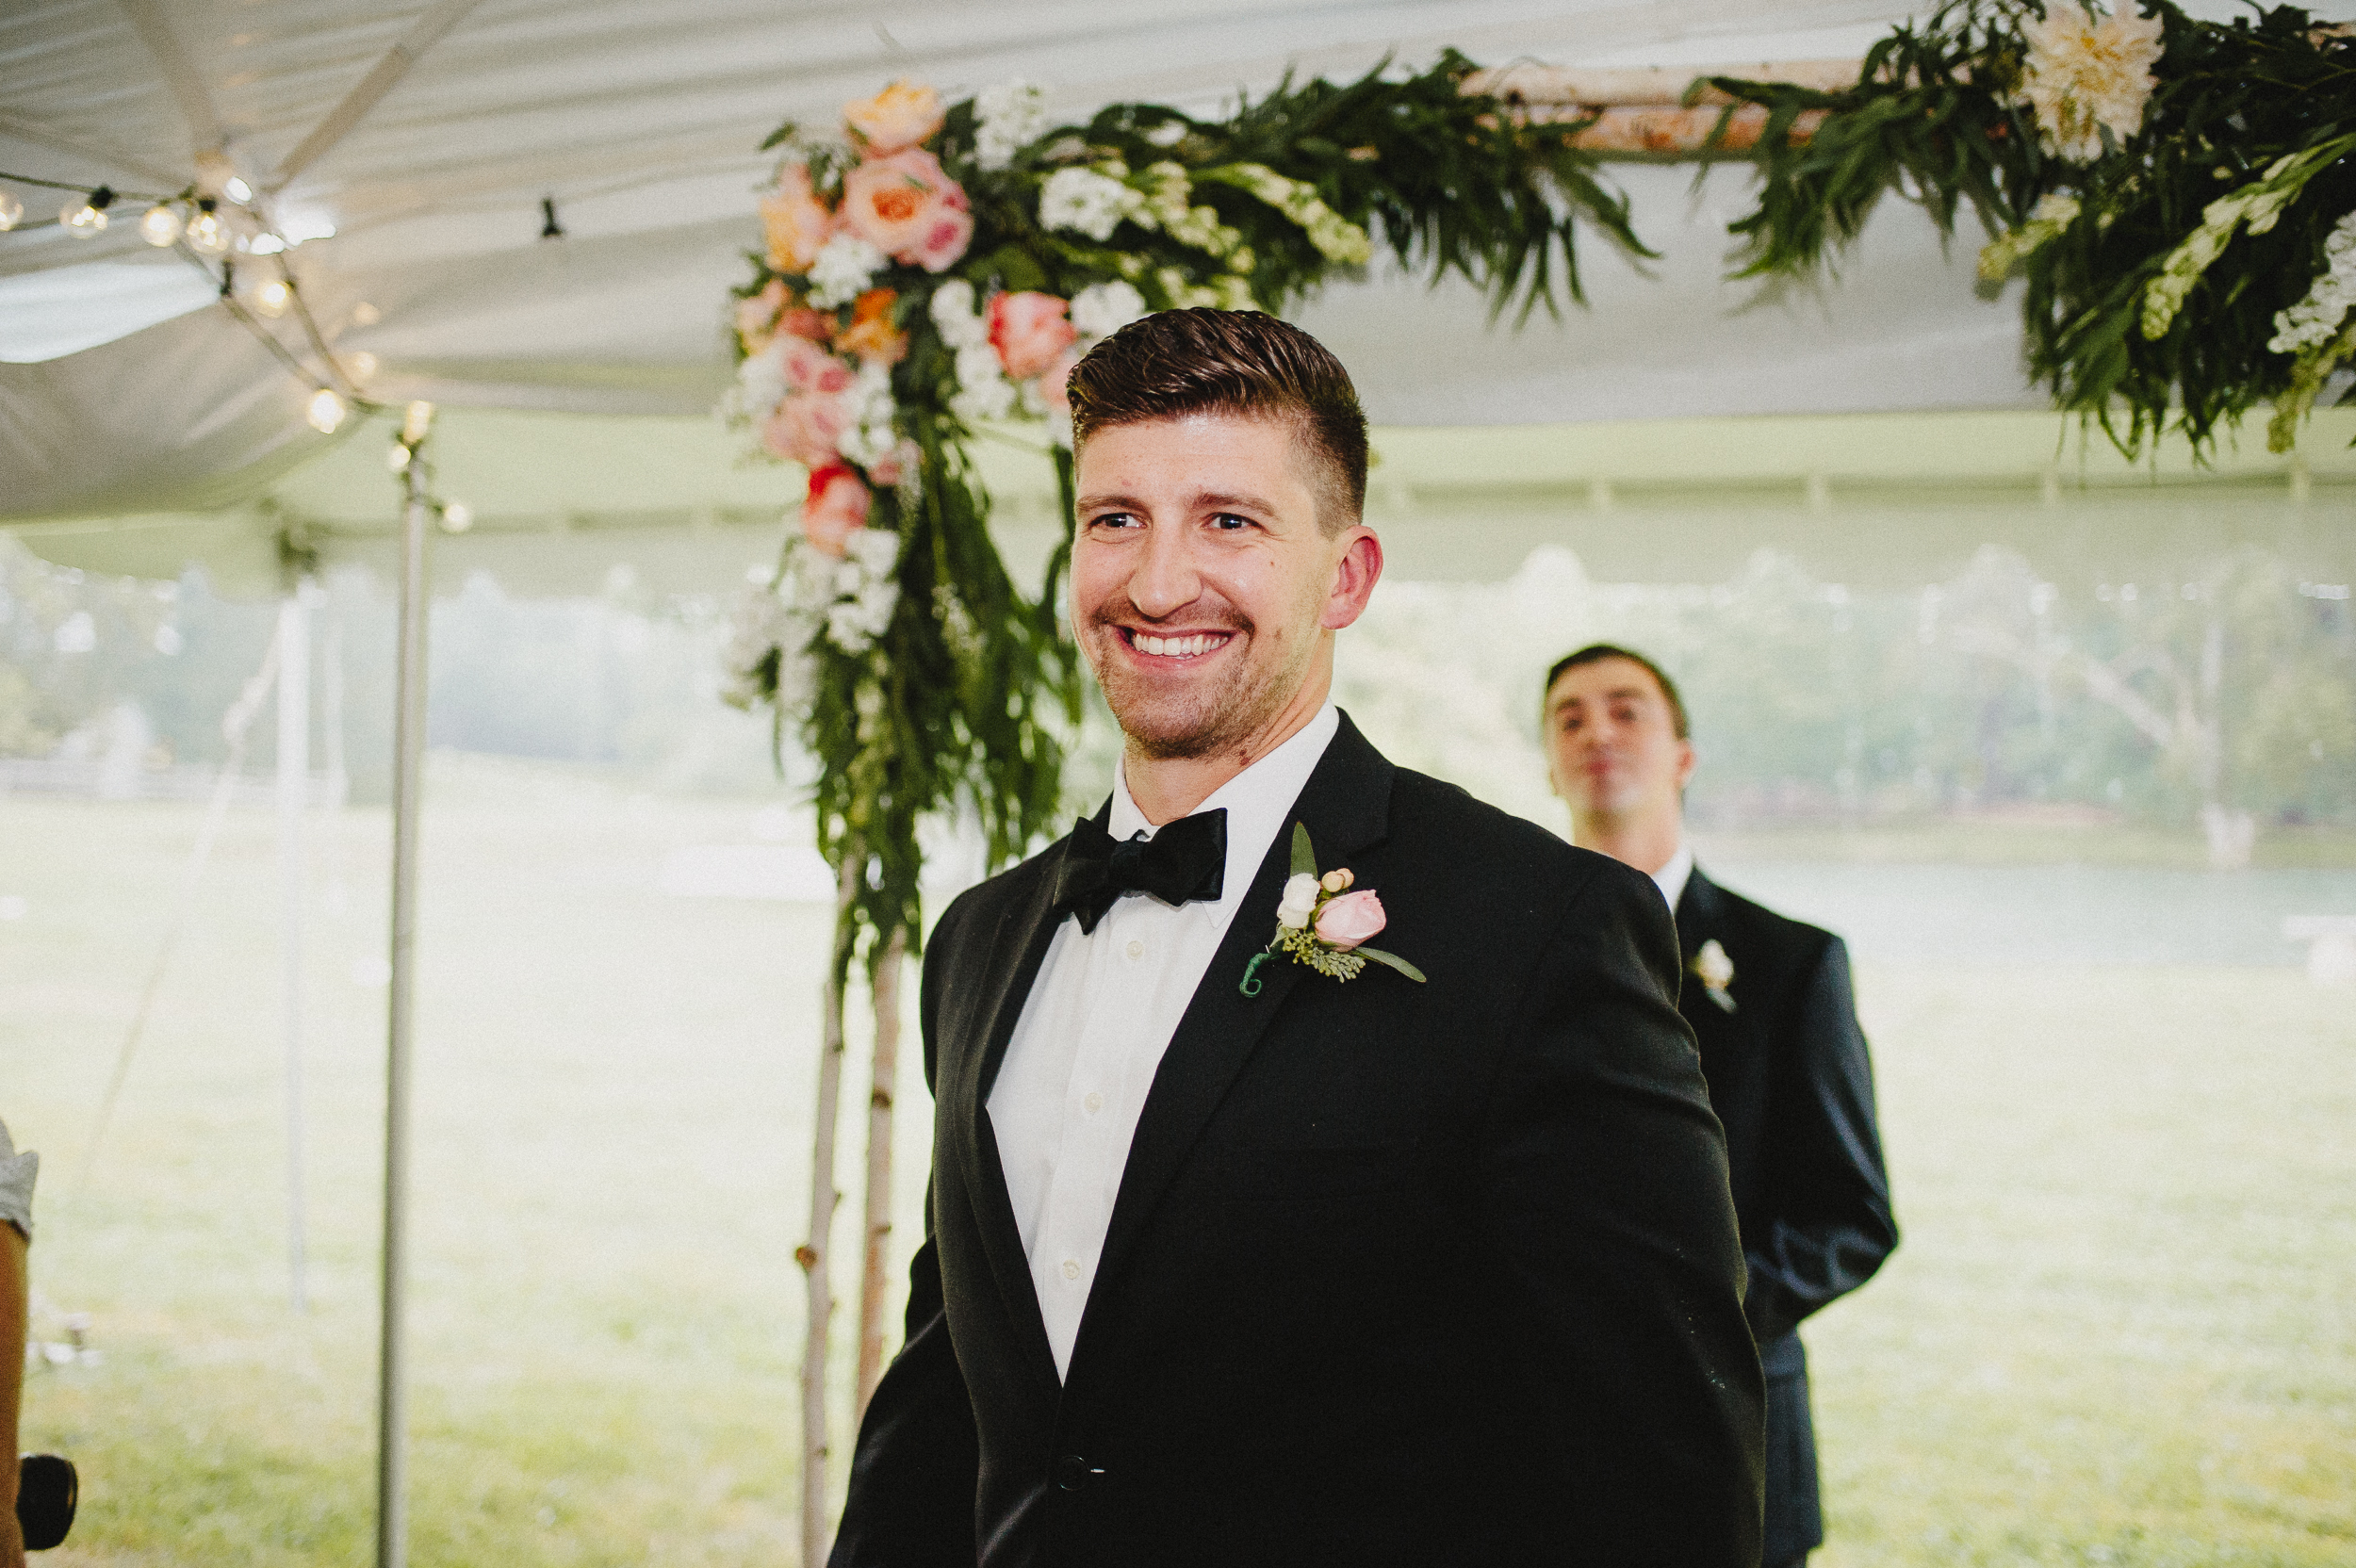 delaware-estate-wedding-photographer-pat-robinson-photography-86.jpg